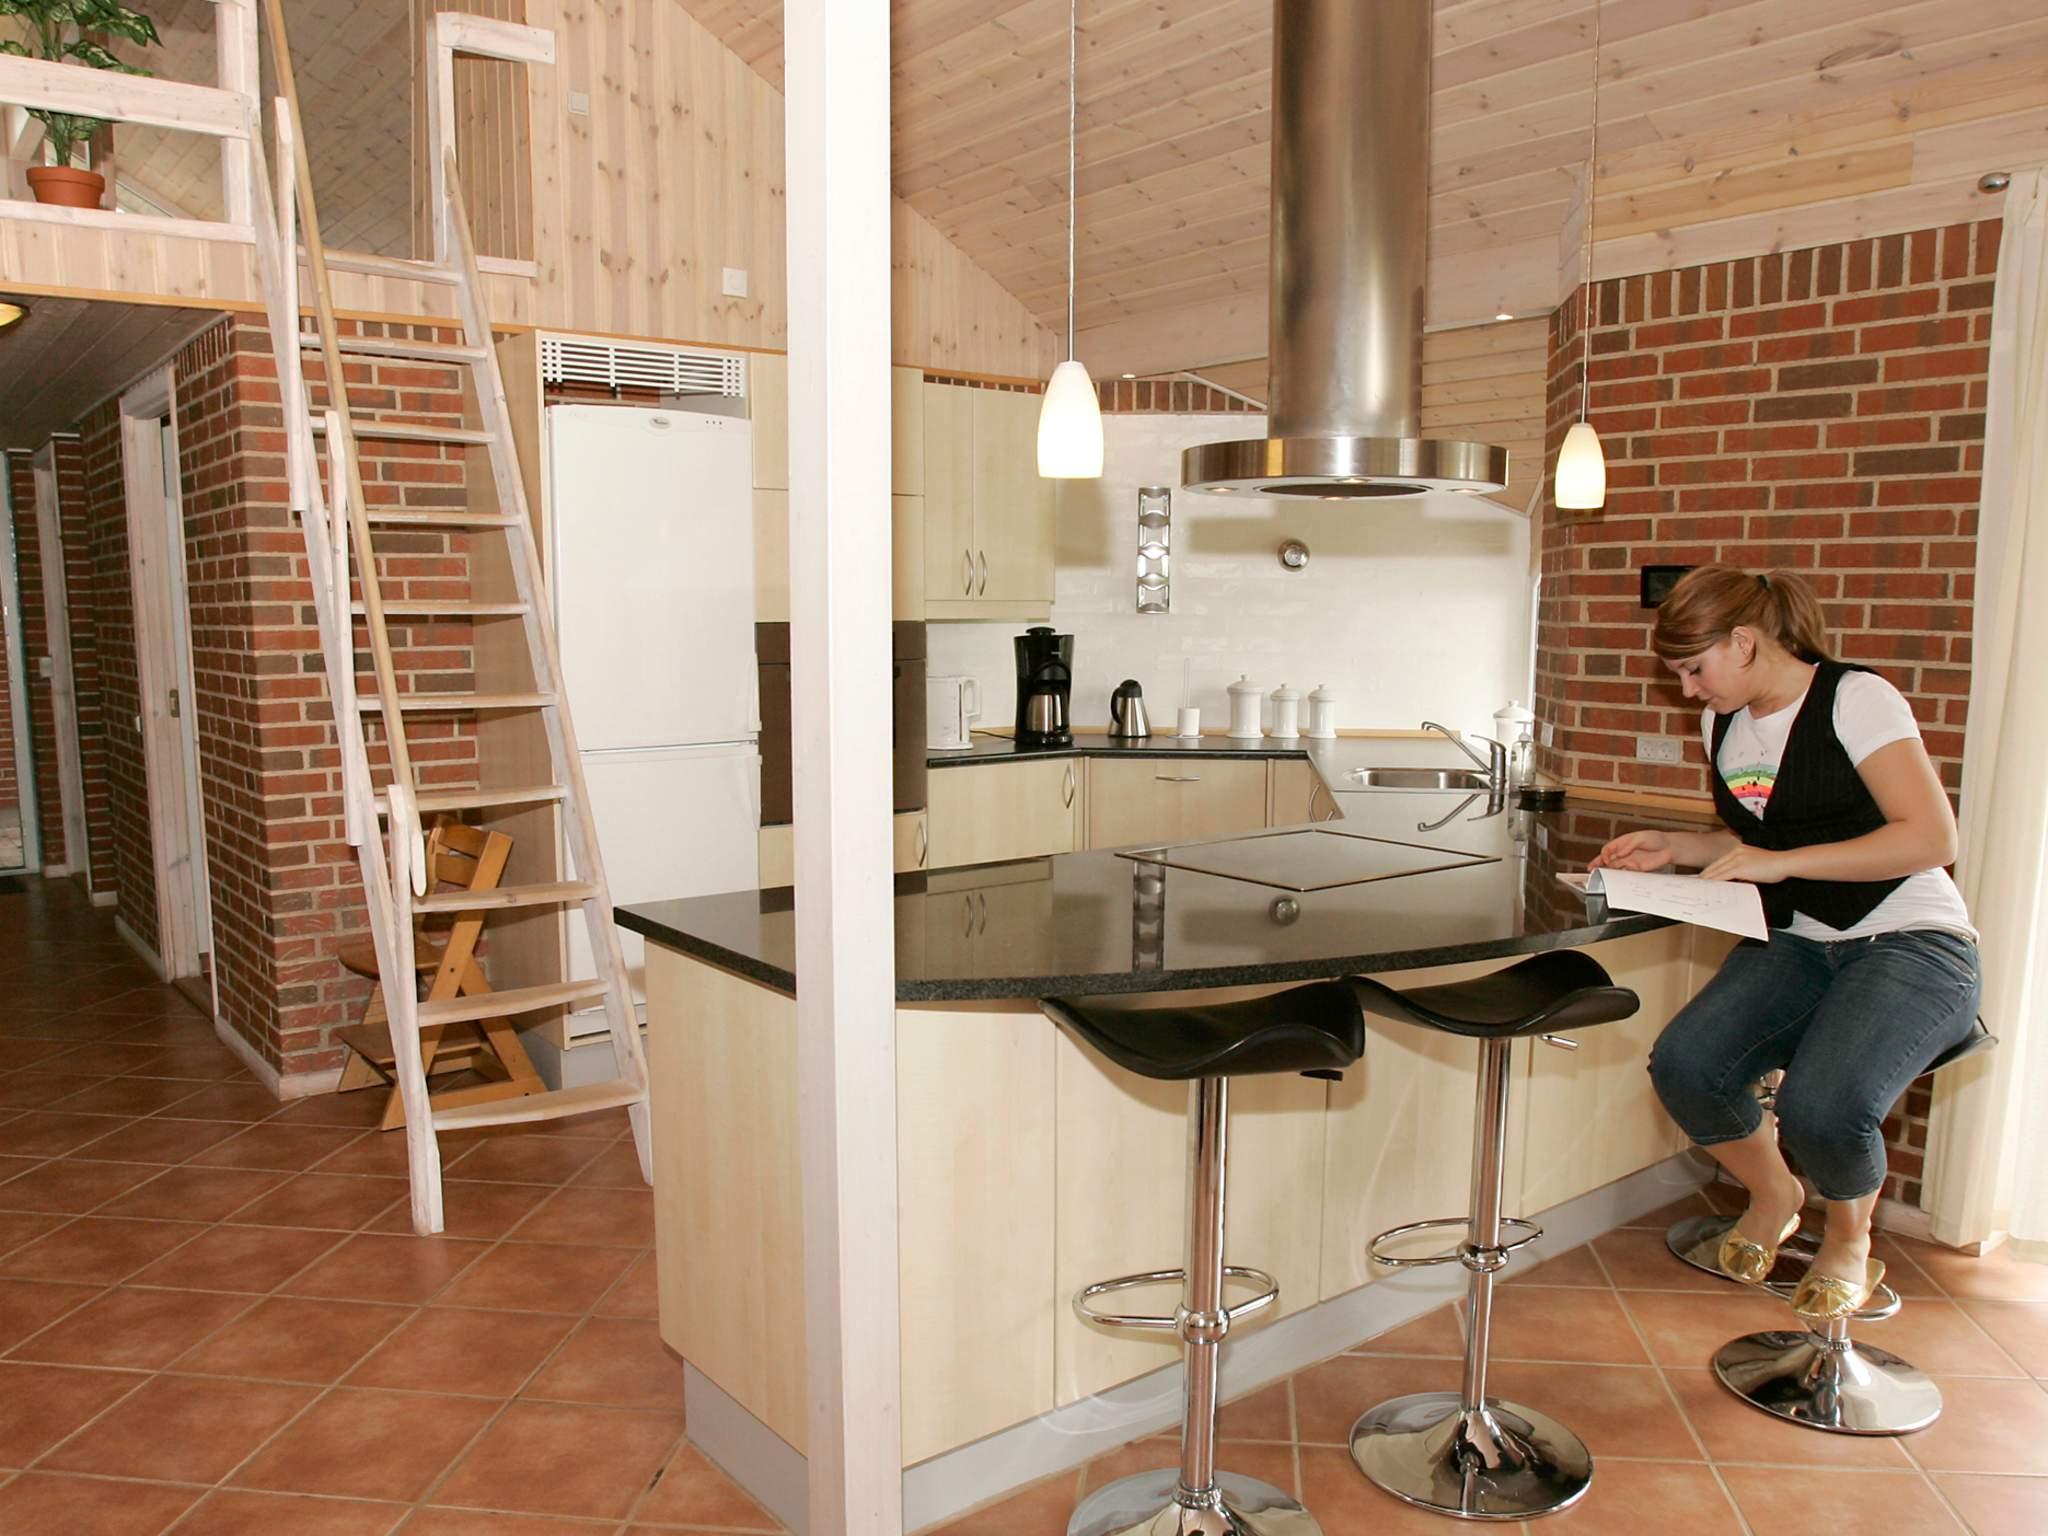 Ferienhaus Øster Hurup (86630), Øster Hurup, , Ostjütland, Dänemark, Bild 5